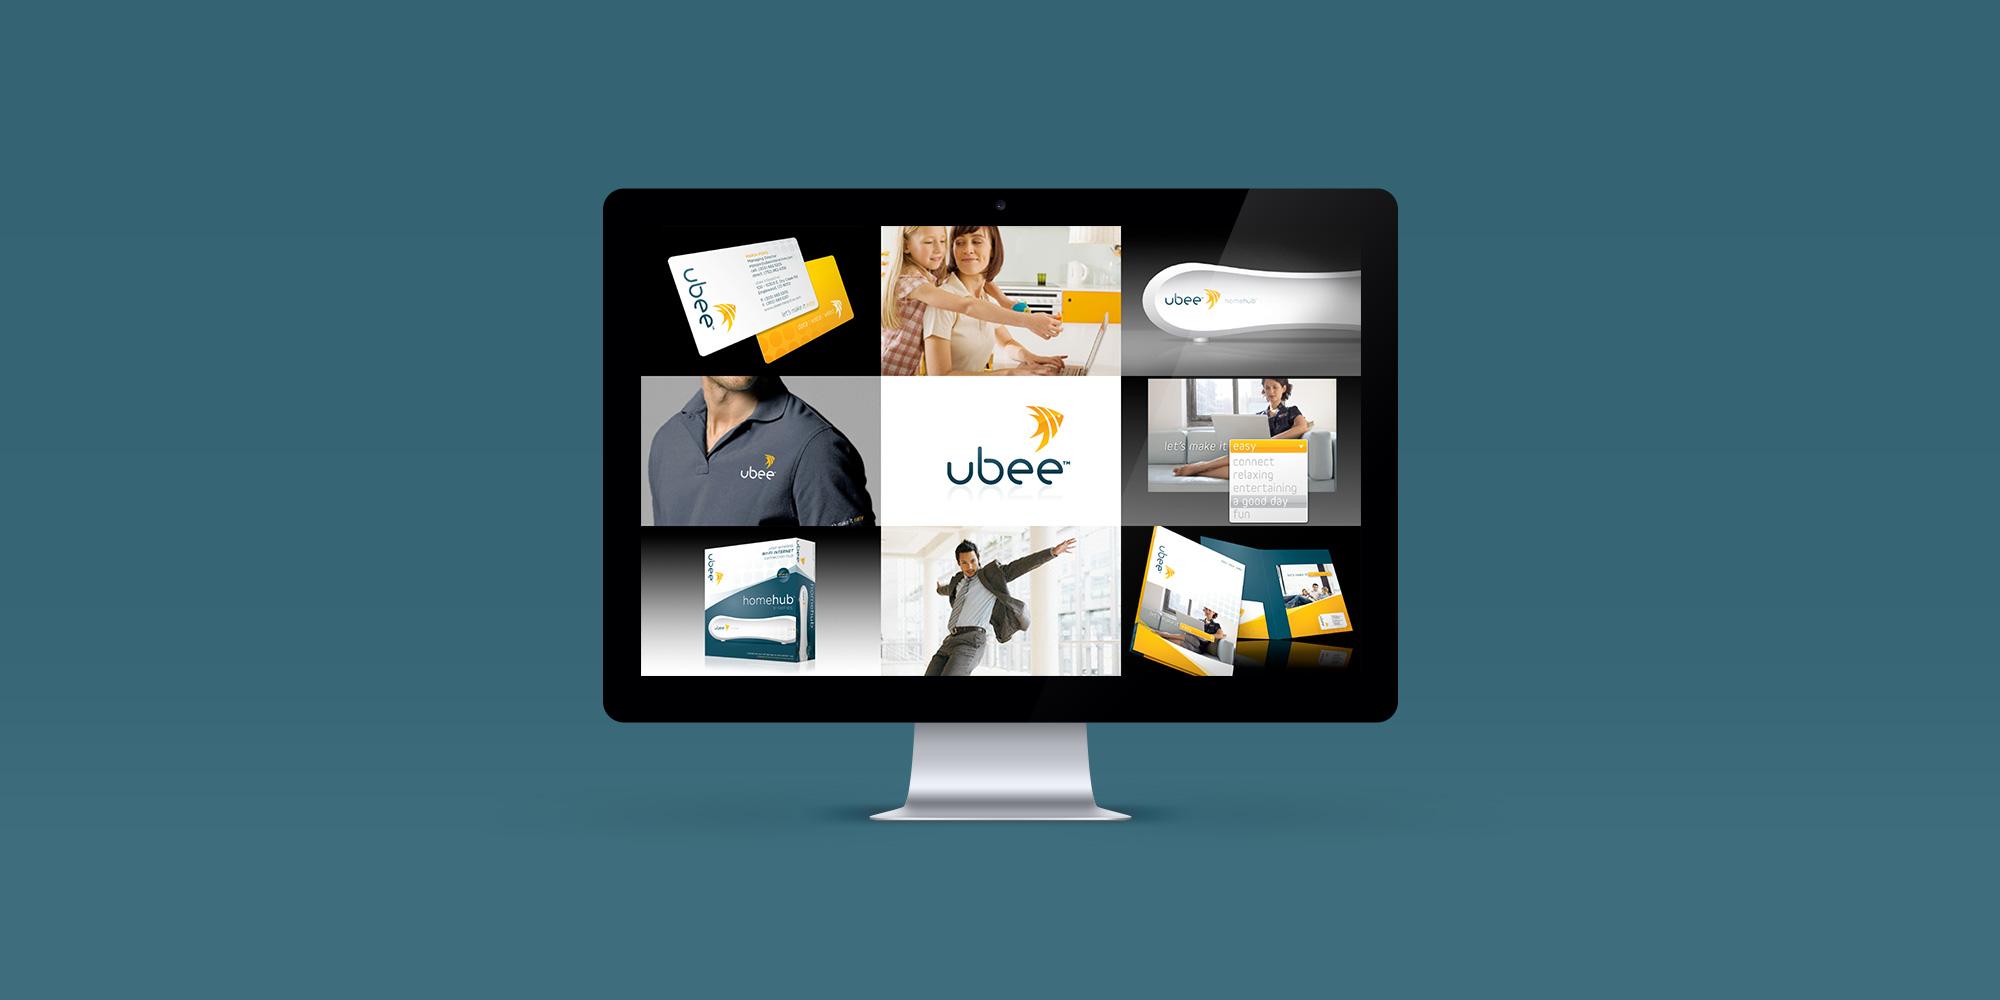 Ubee brand visuals mockup on iMac